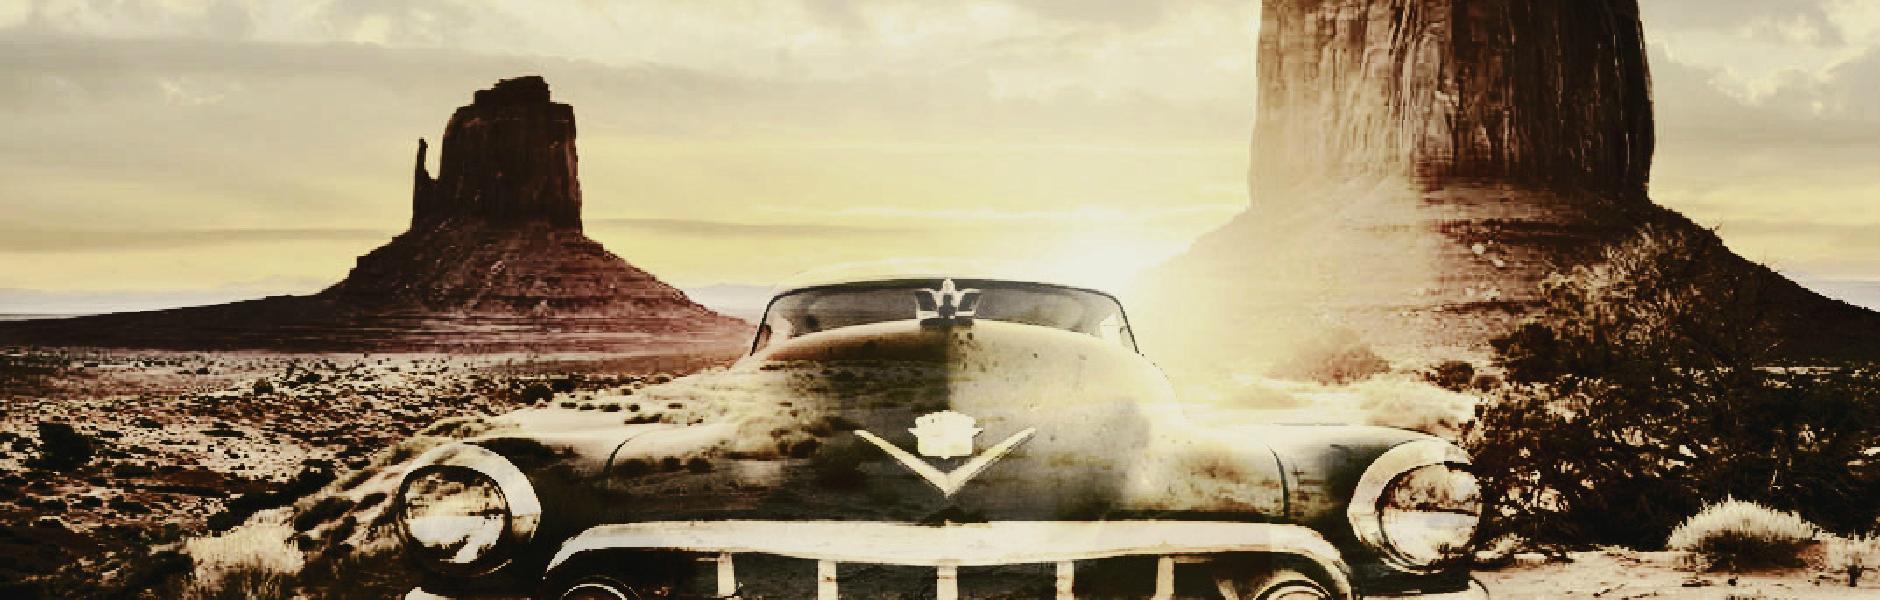 Stone Age Cadillac